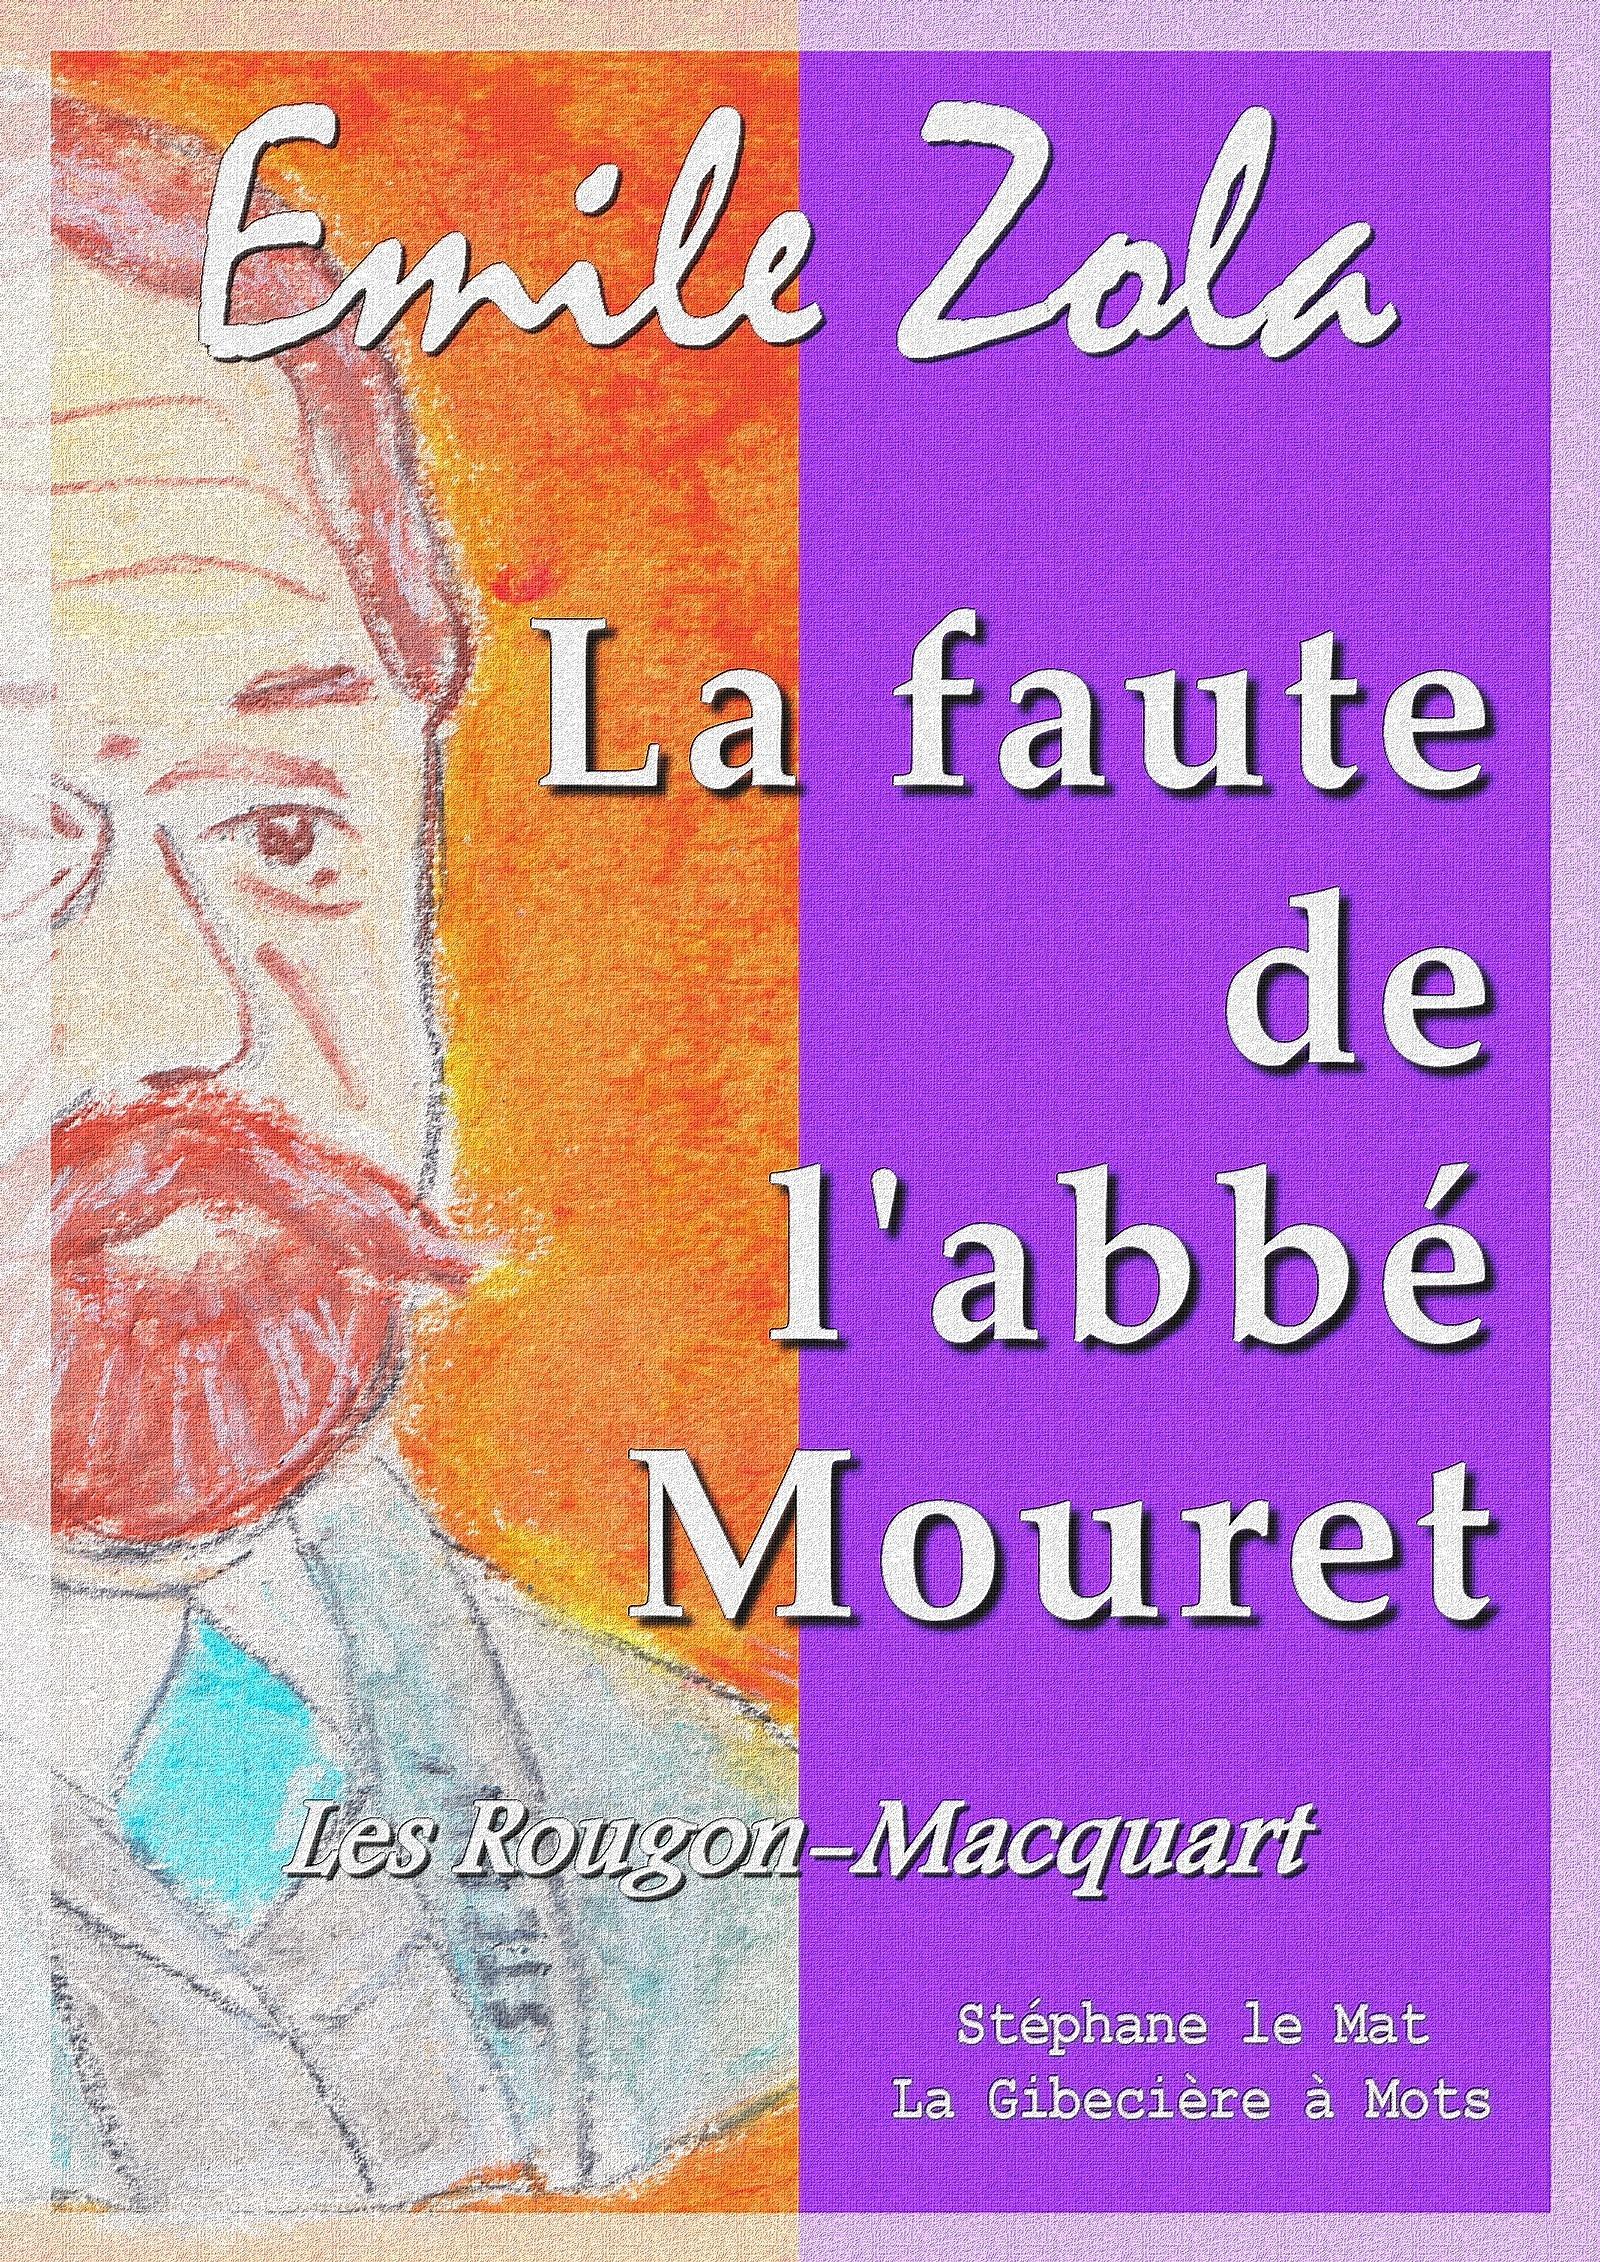 La faute de l'abbé Mouret, LES ROUGON-MACQUART 5/20